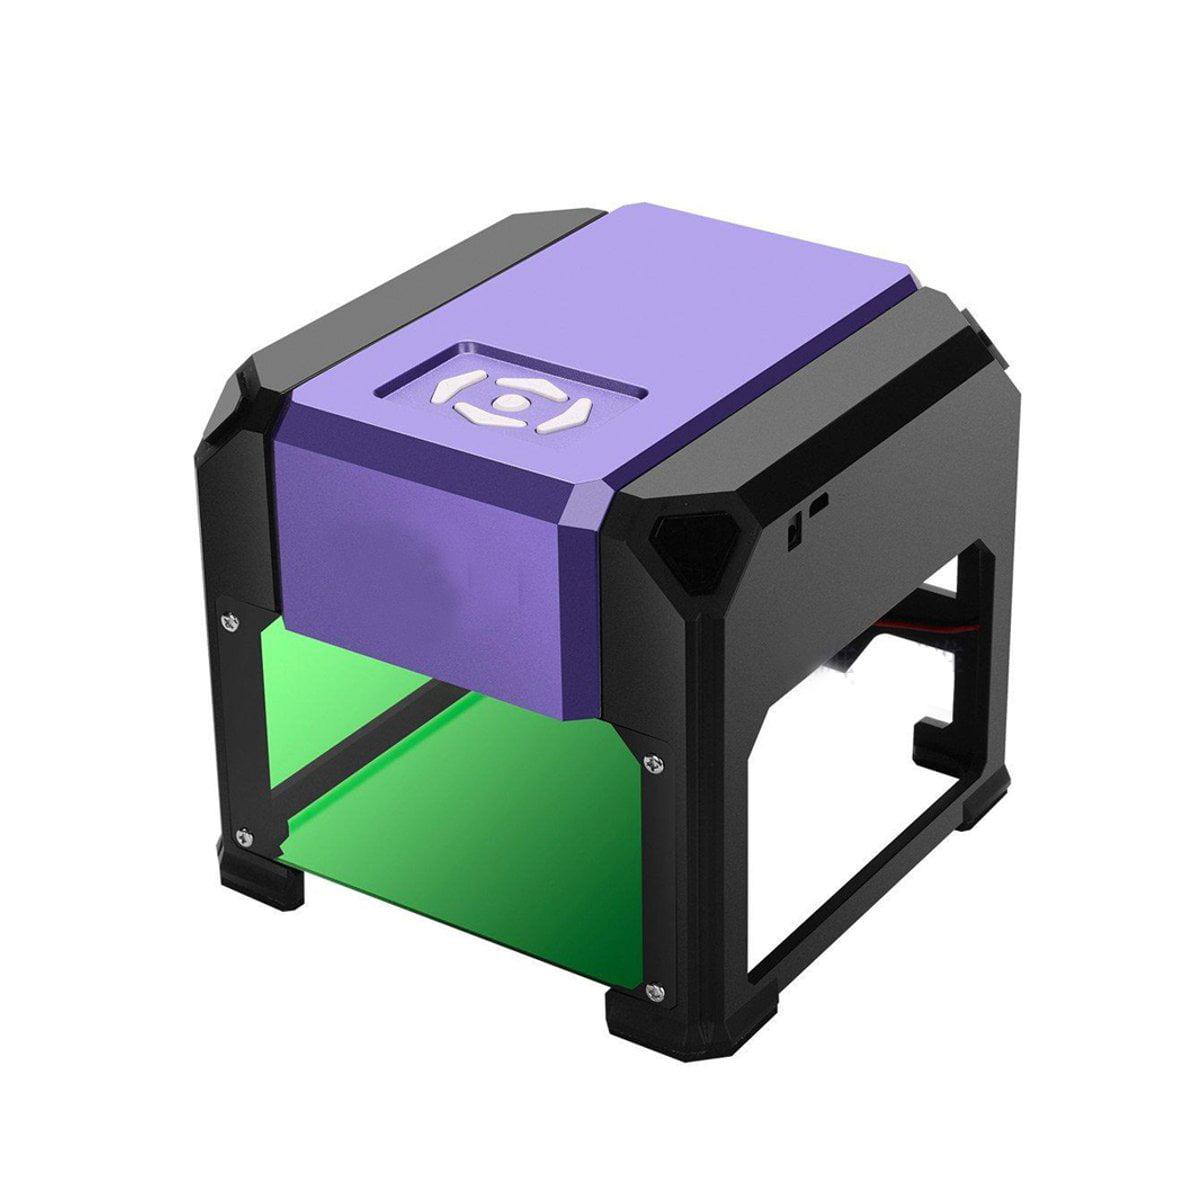 DIY Desktop Laser Engraving Machine Marking Engraver Cutter Printer 3000mW/2000mW/1500mW  Black/golden/purple